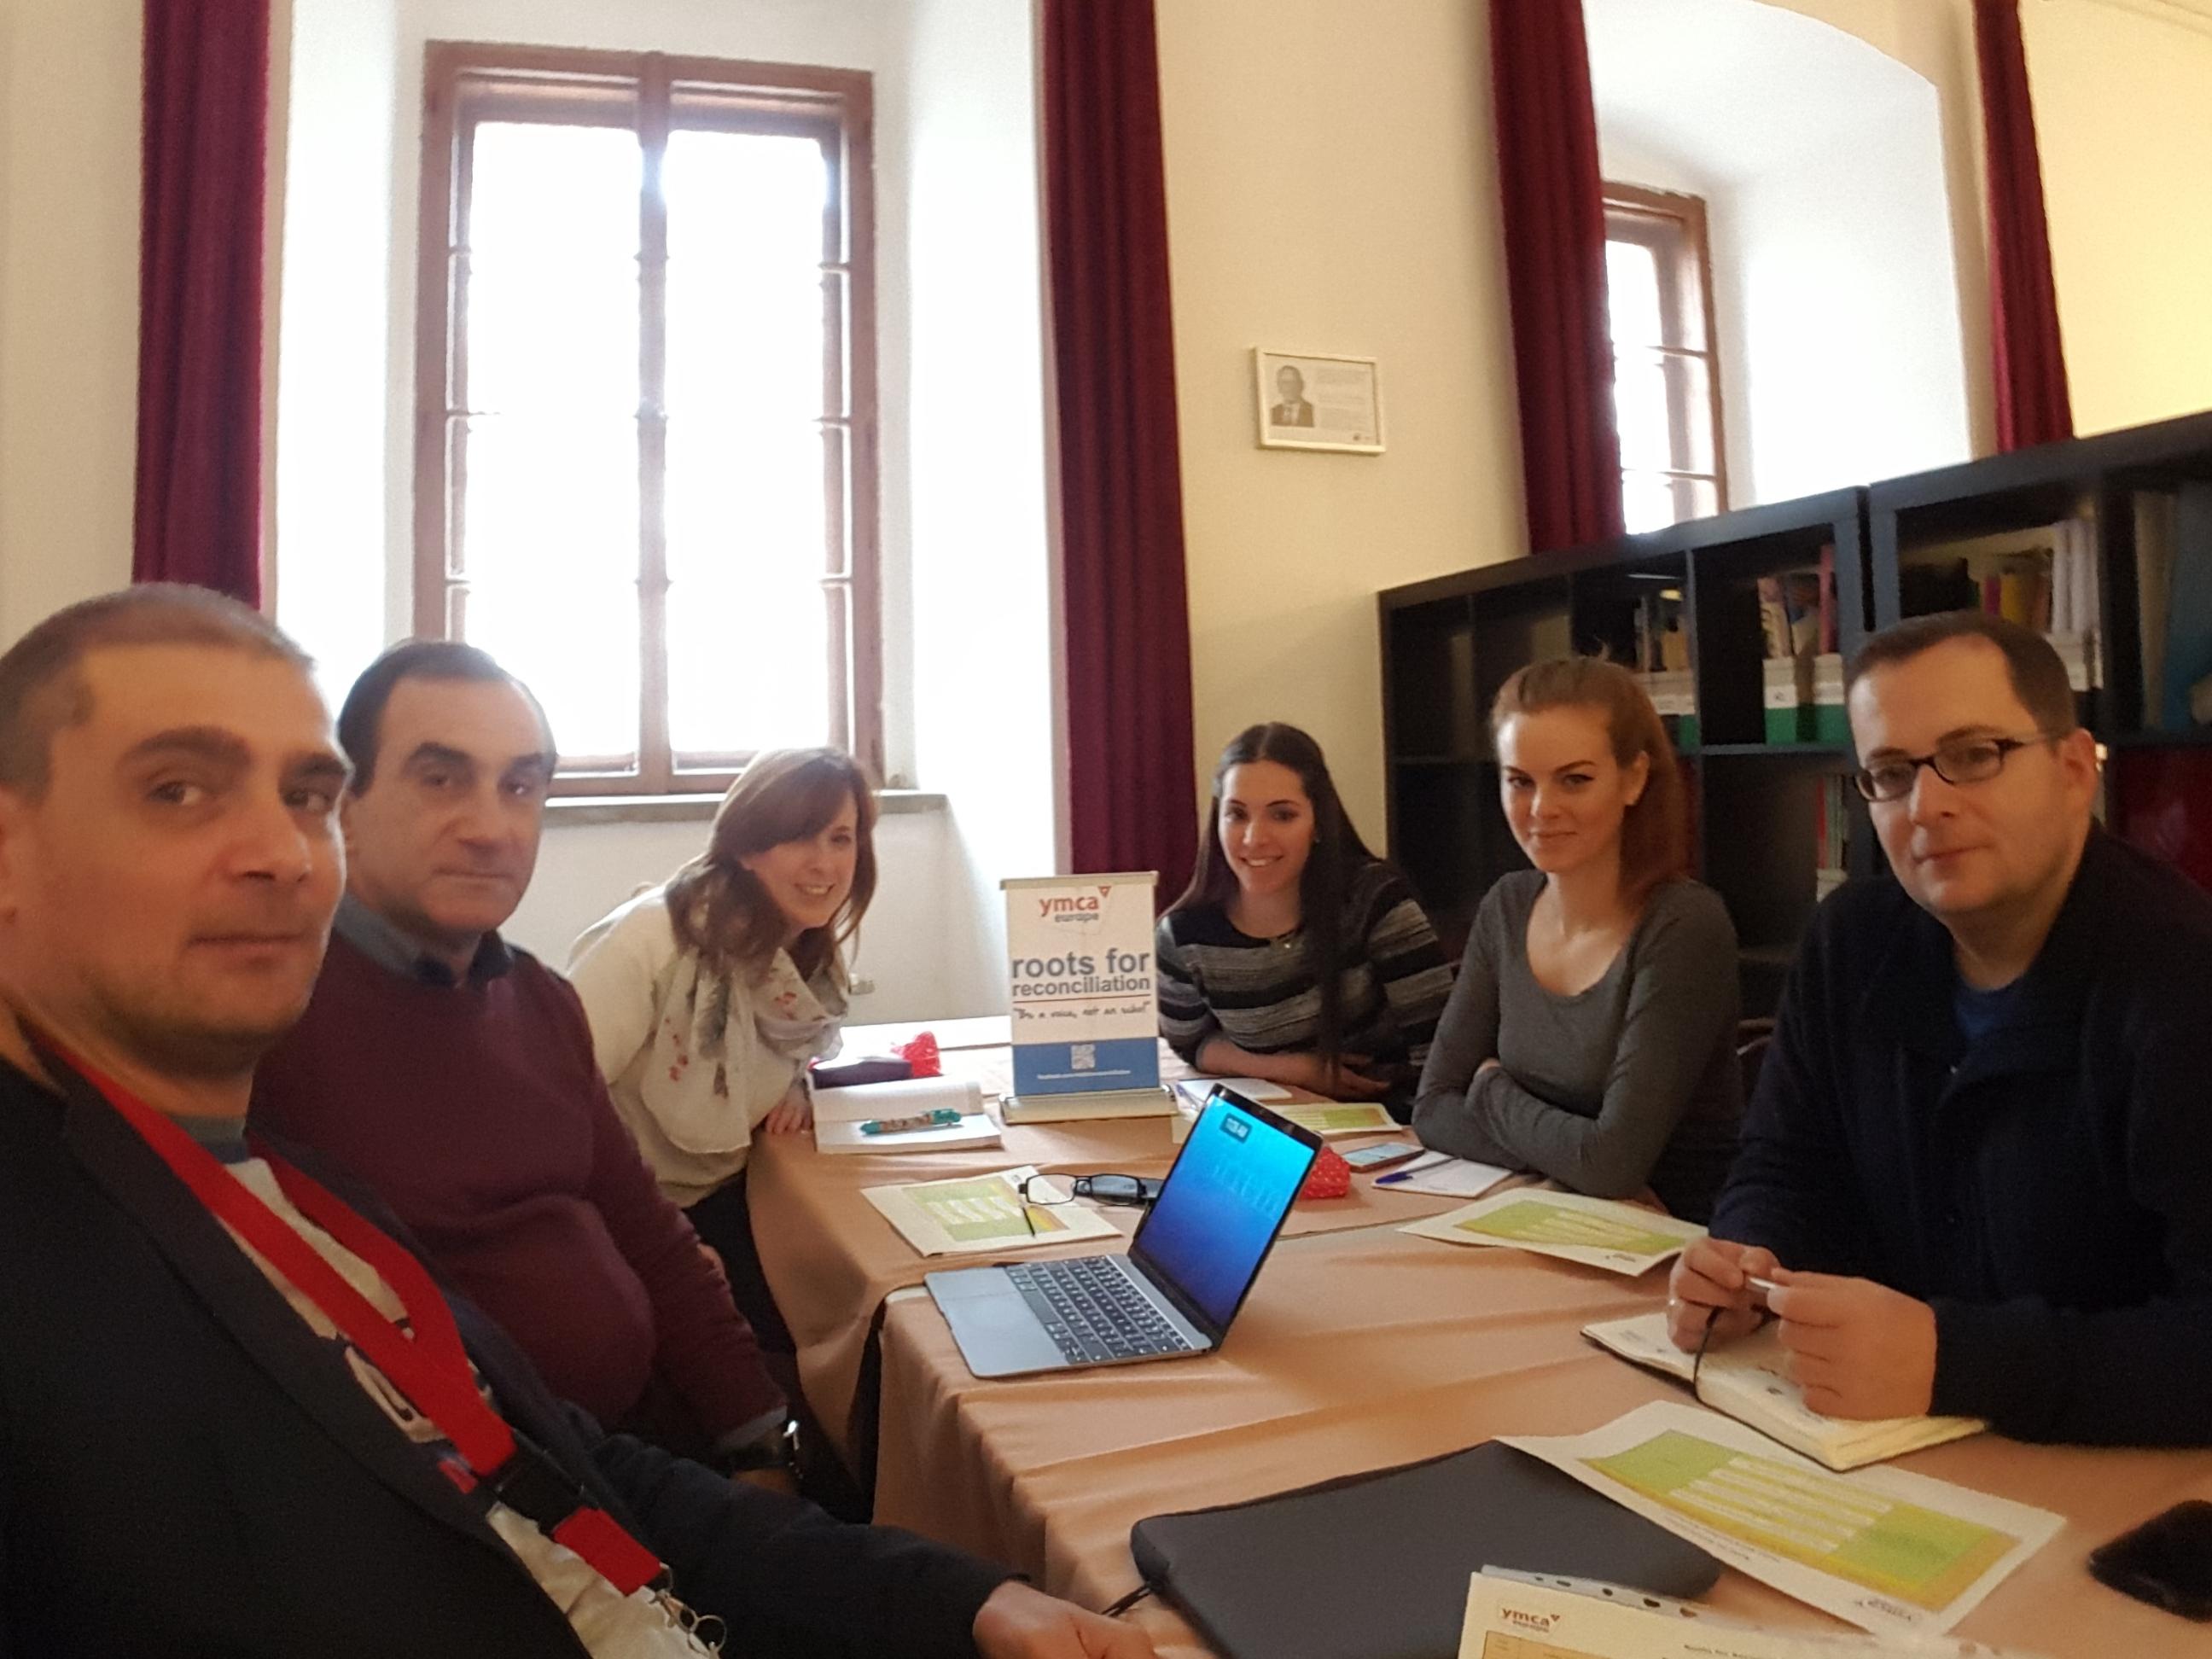 The Peace Work Institute Planning Team: Vardan Hambardzumyan, Rezi Shavladze, Rachel Dyne, Ivana Ilic, Christina Kyriakou, Marius Pop